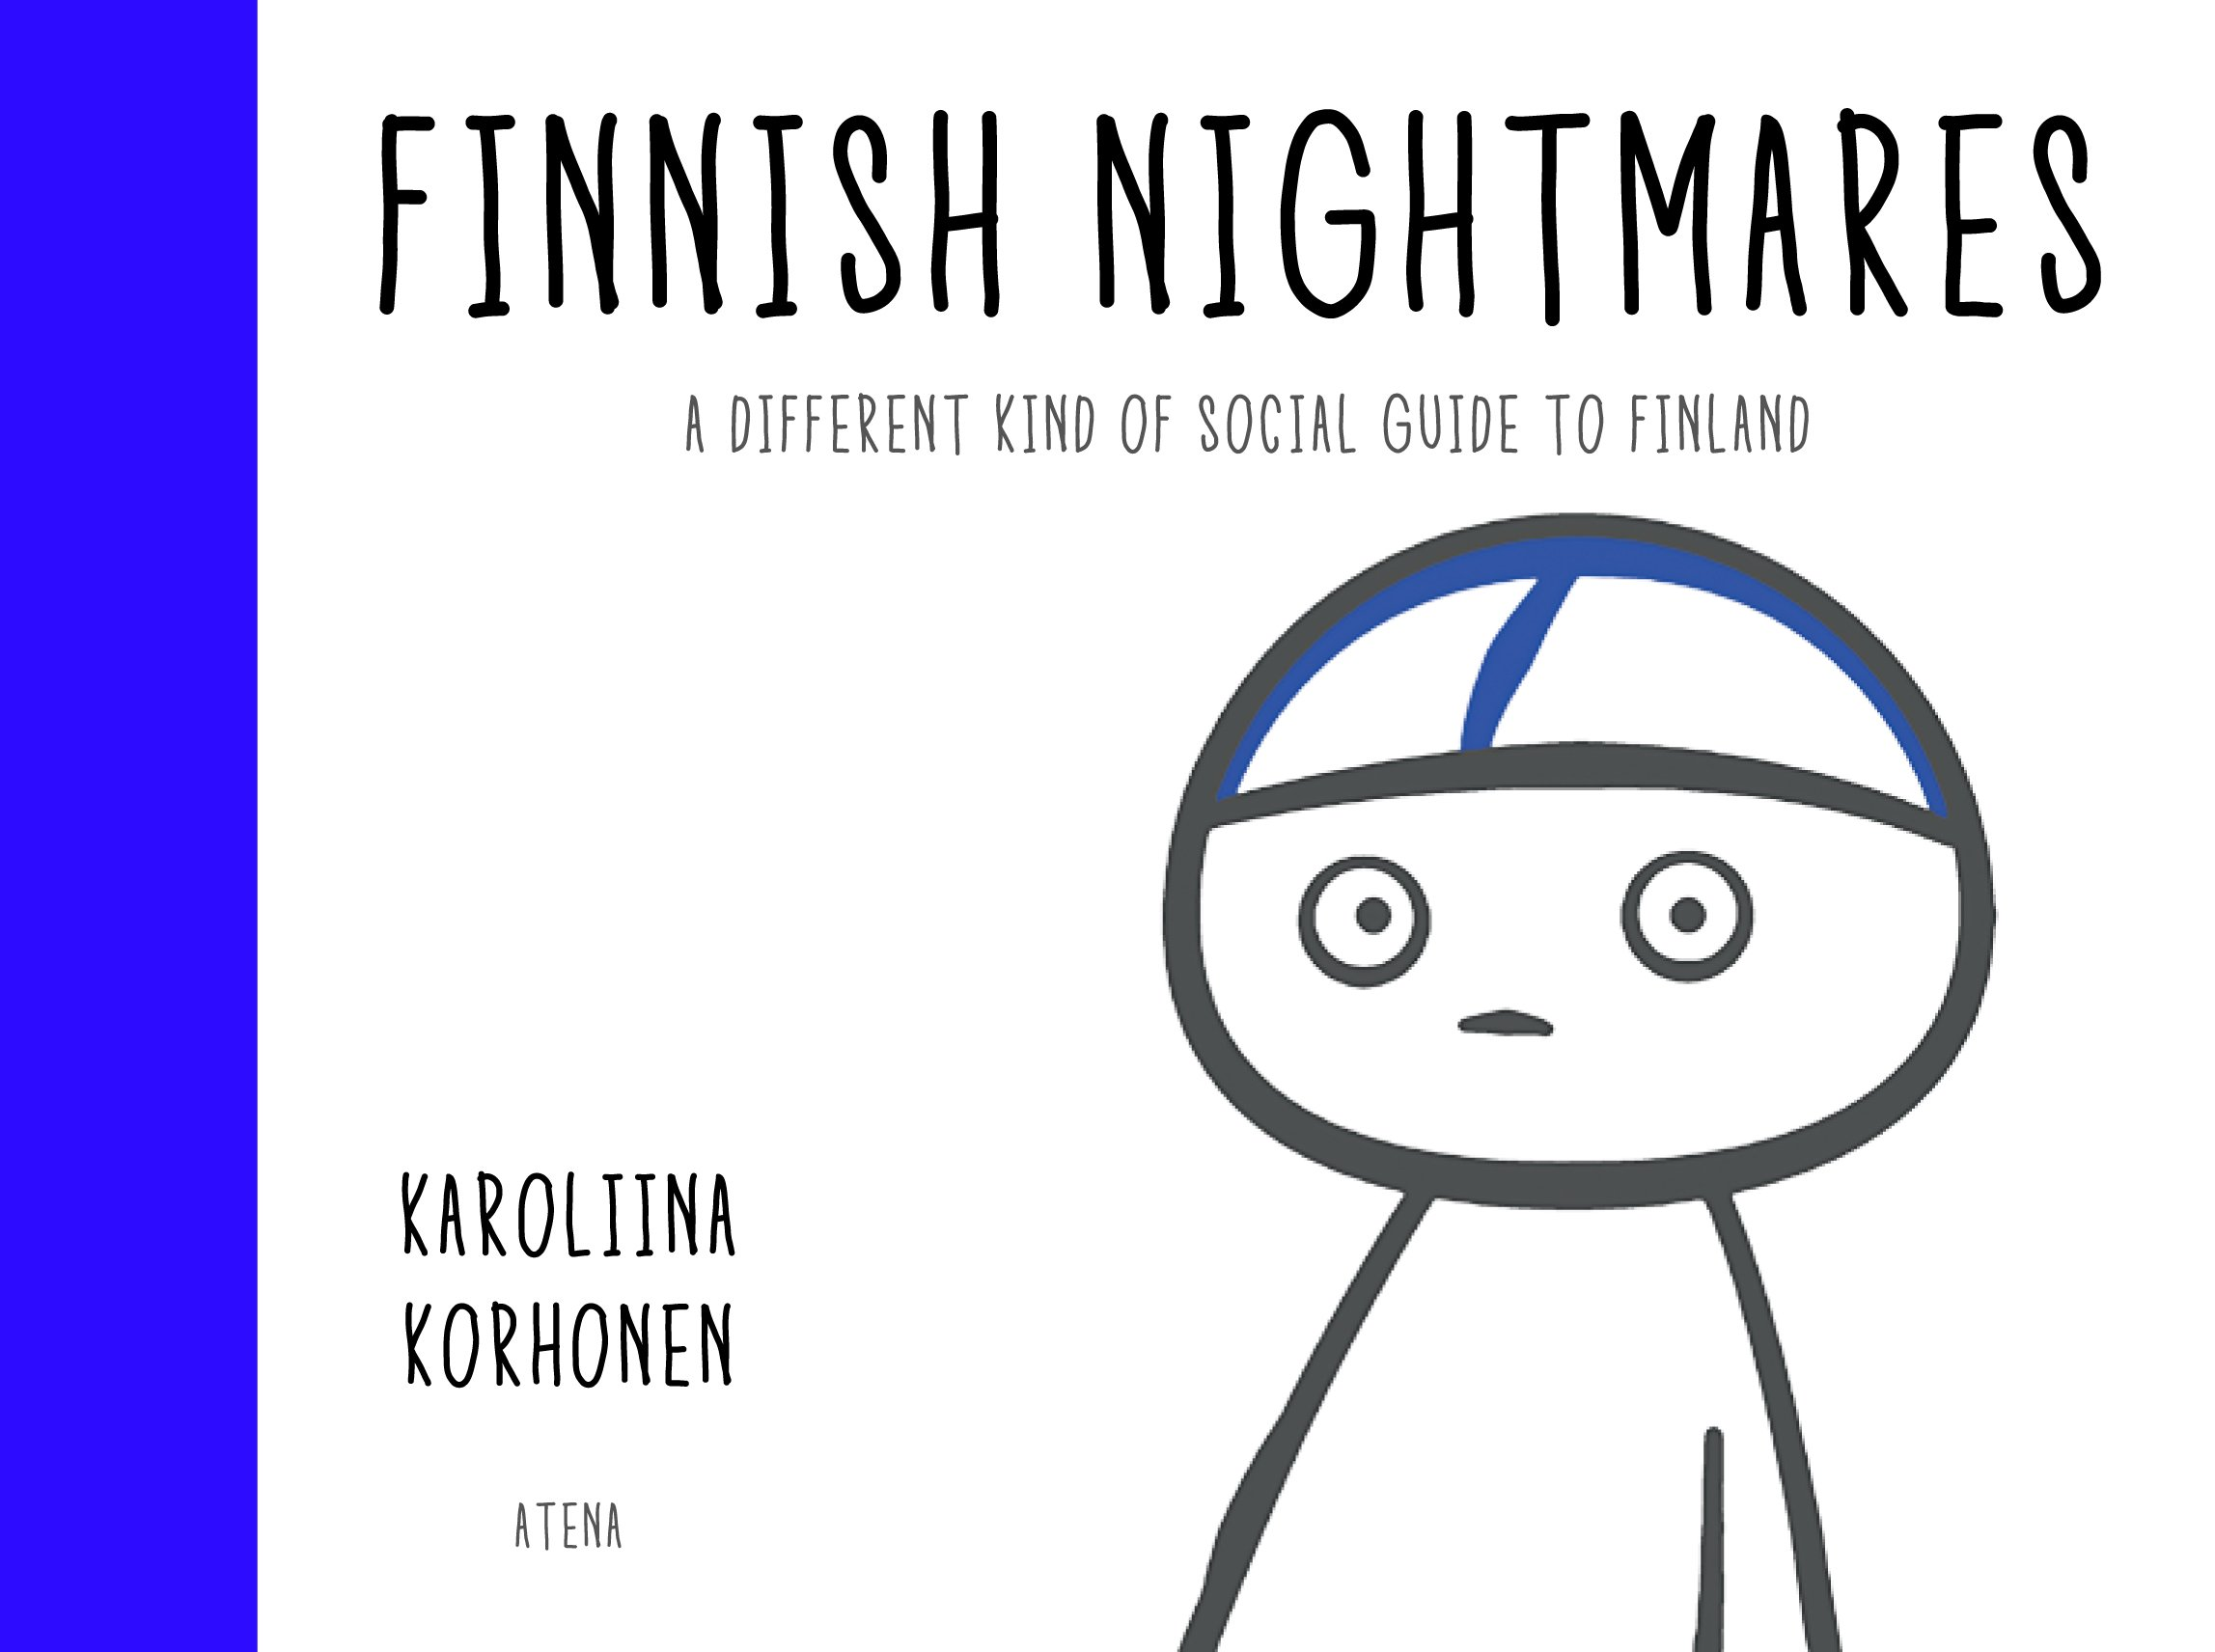 Finnish Nightmares: Karoliina Korhonen: 9789523002227: Amazon.com: Books